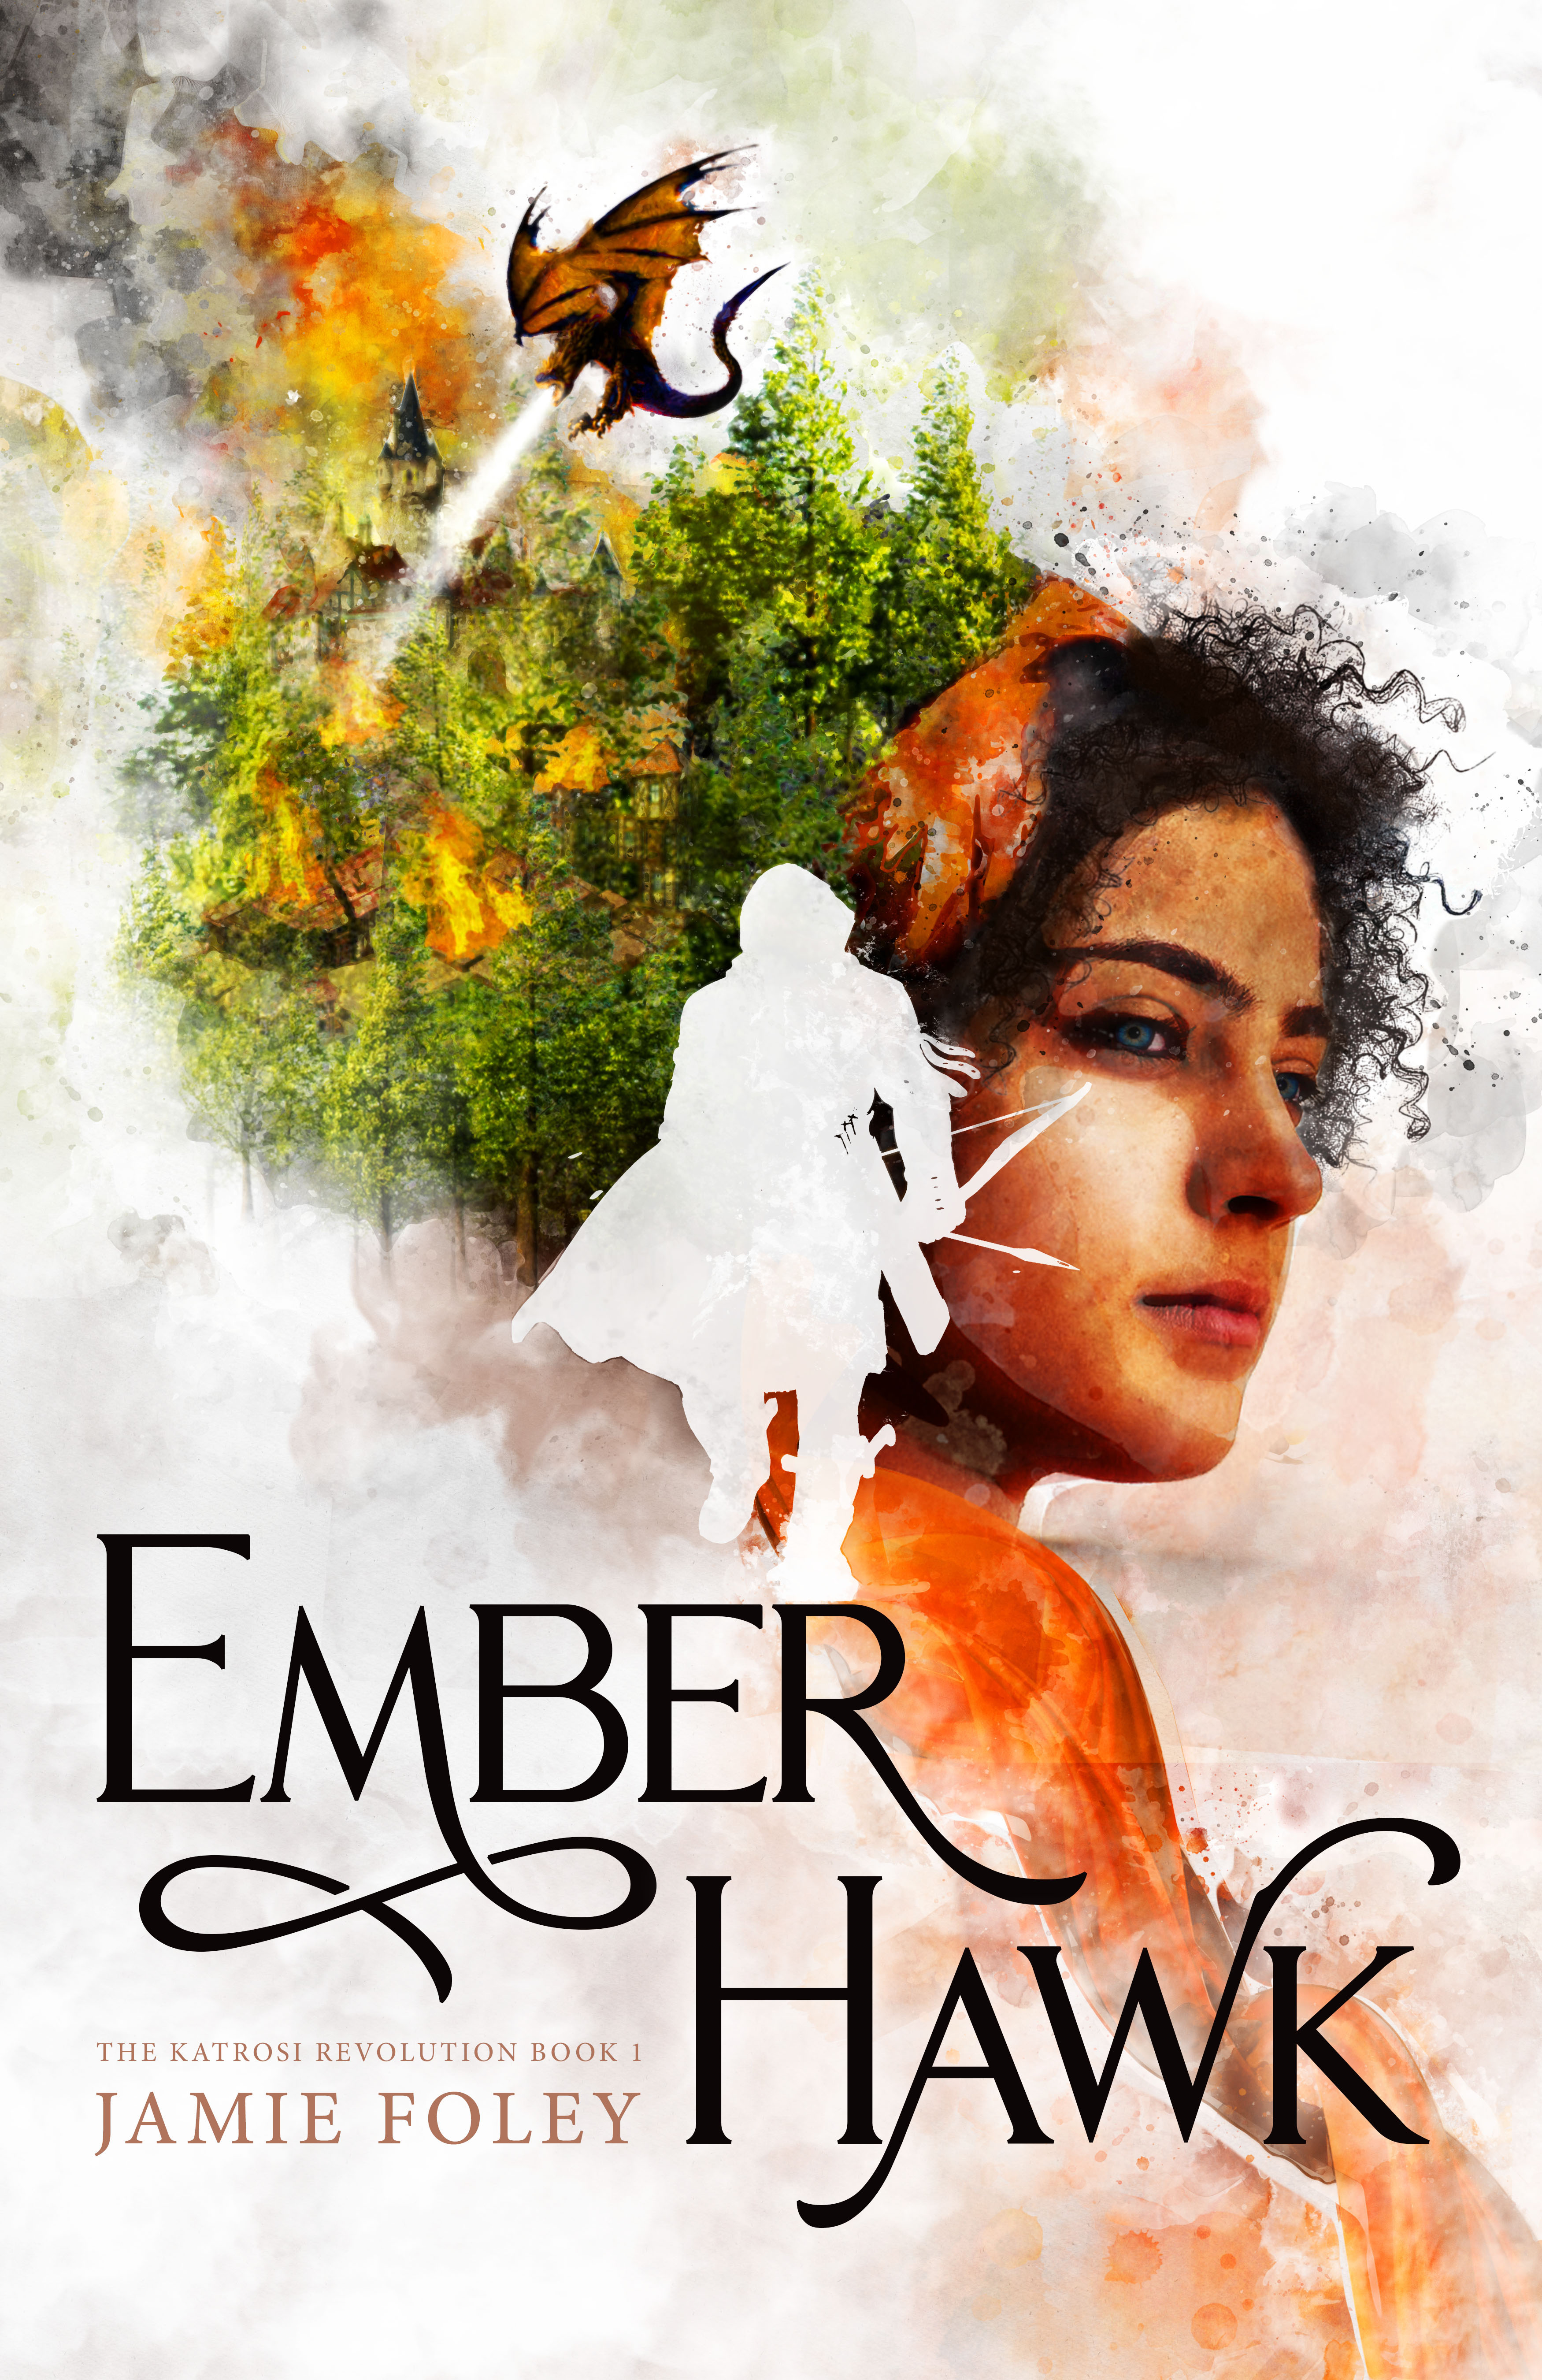 Emberhawk - Jamie Foley